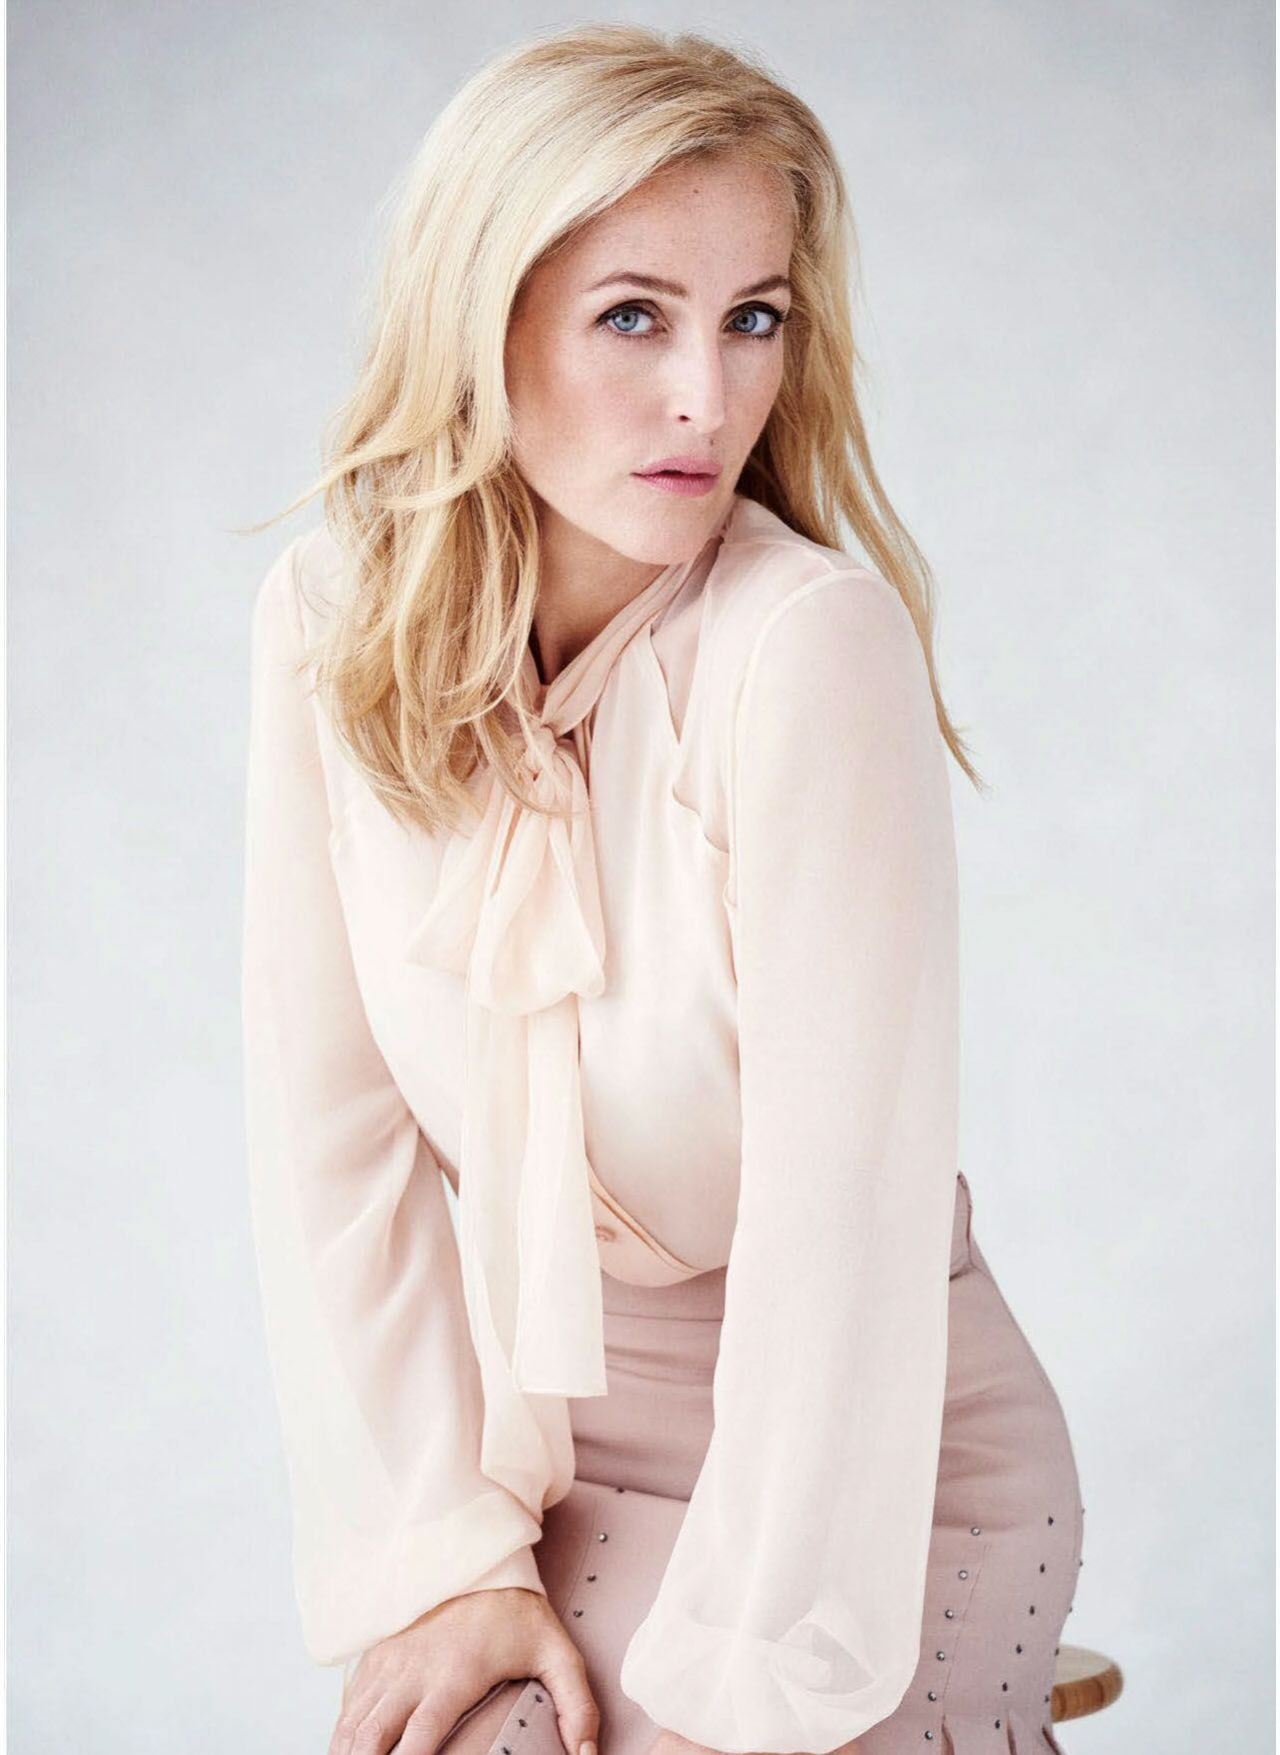 Gillian Anderson Harper S Bazaar Australia November 2016 Issue